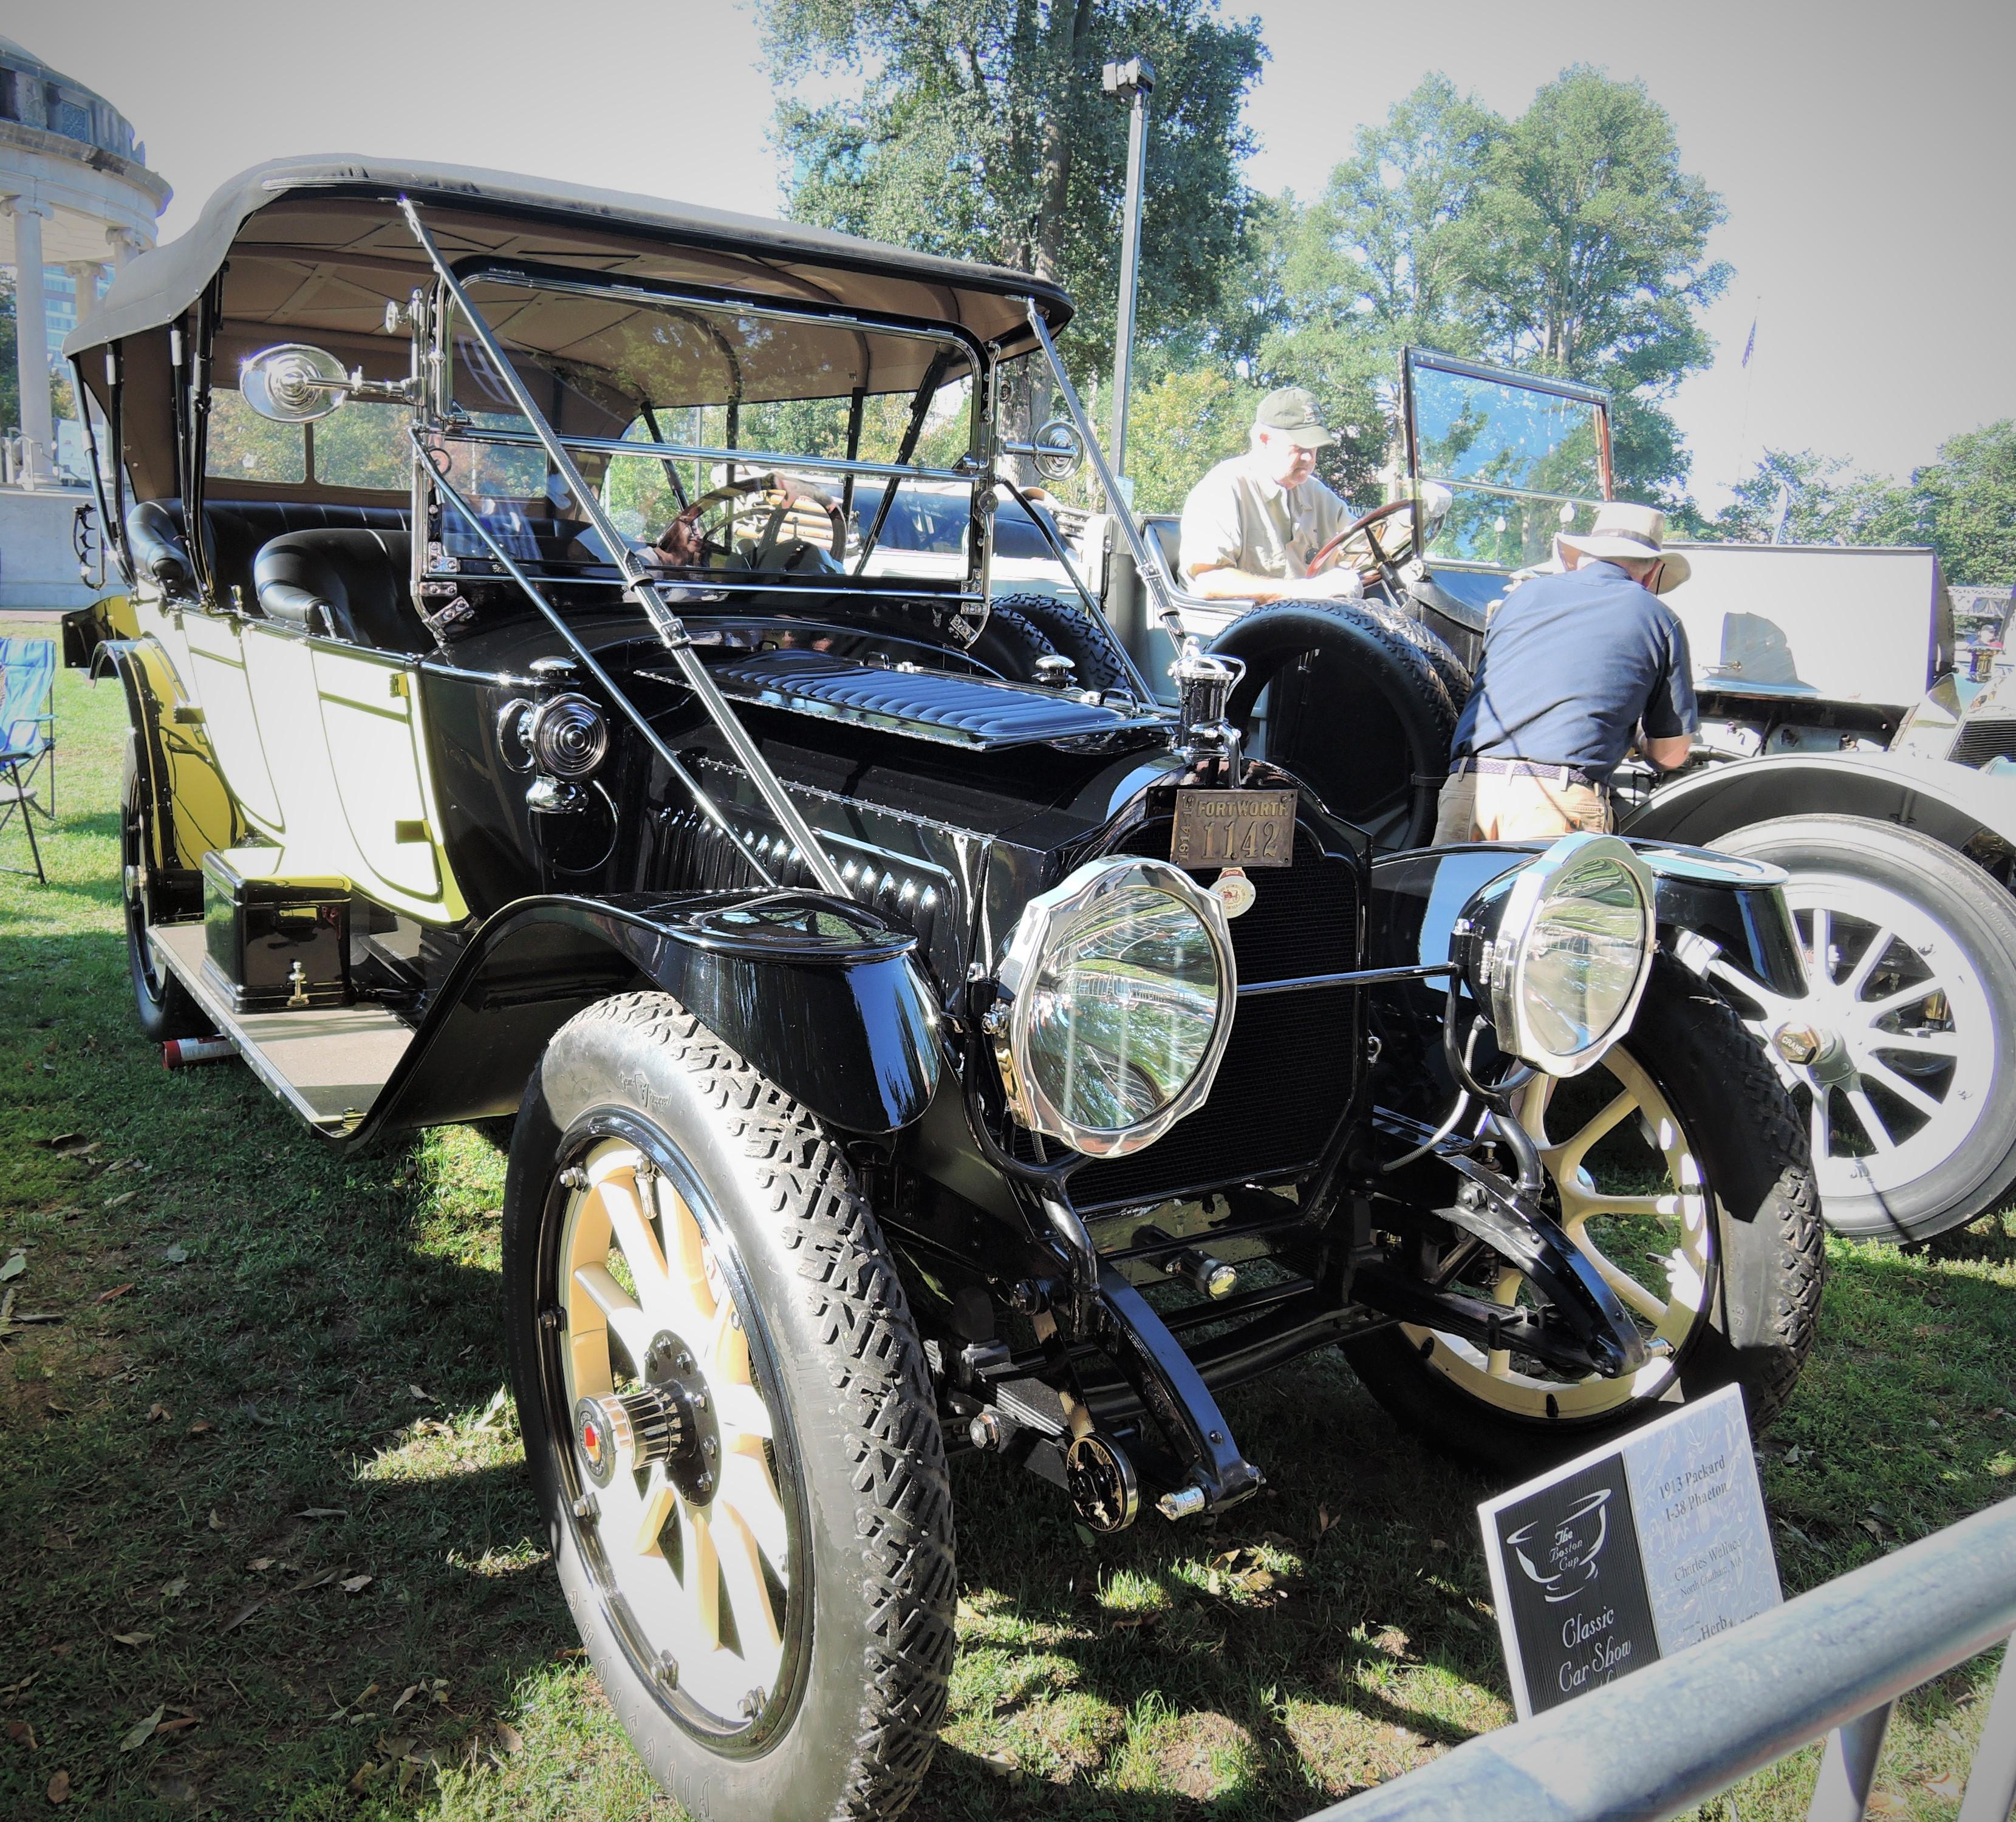 yellow/lack 1913 Packard I-38 Phaeton - The Boston Cup 2017